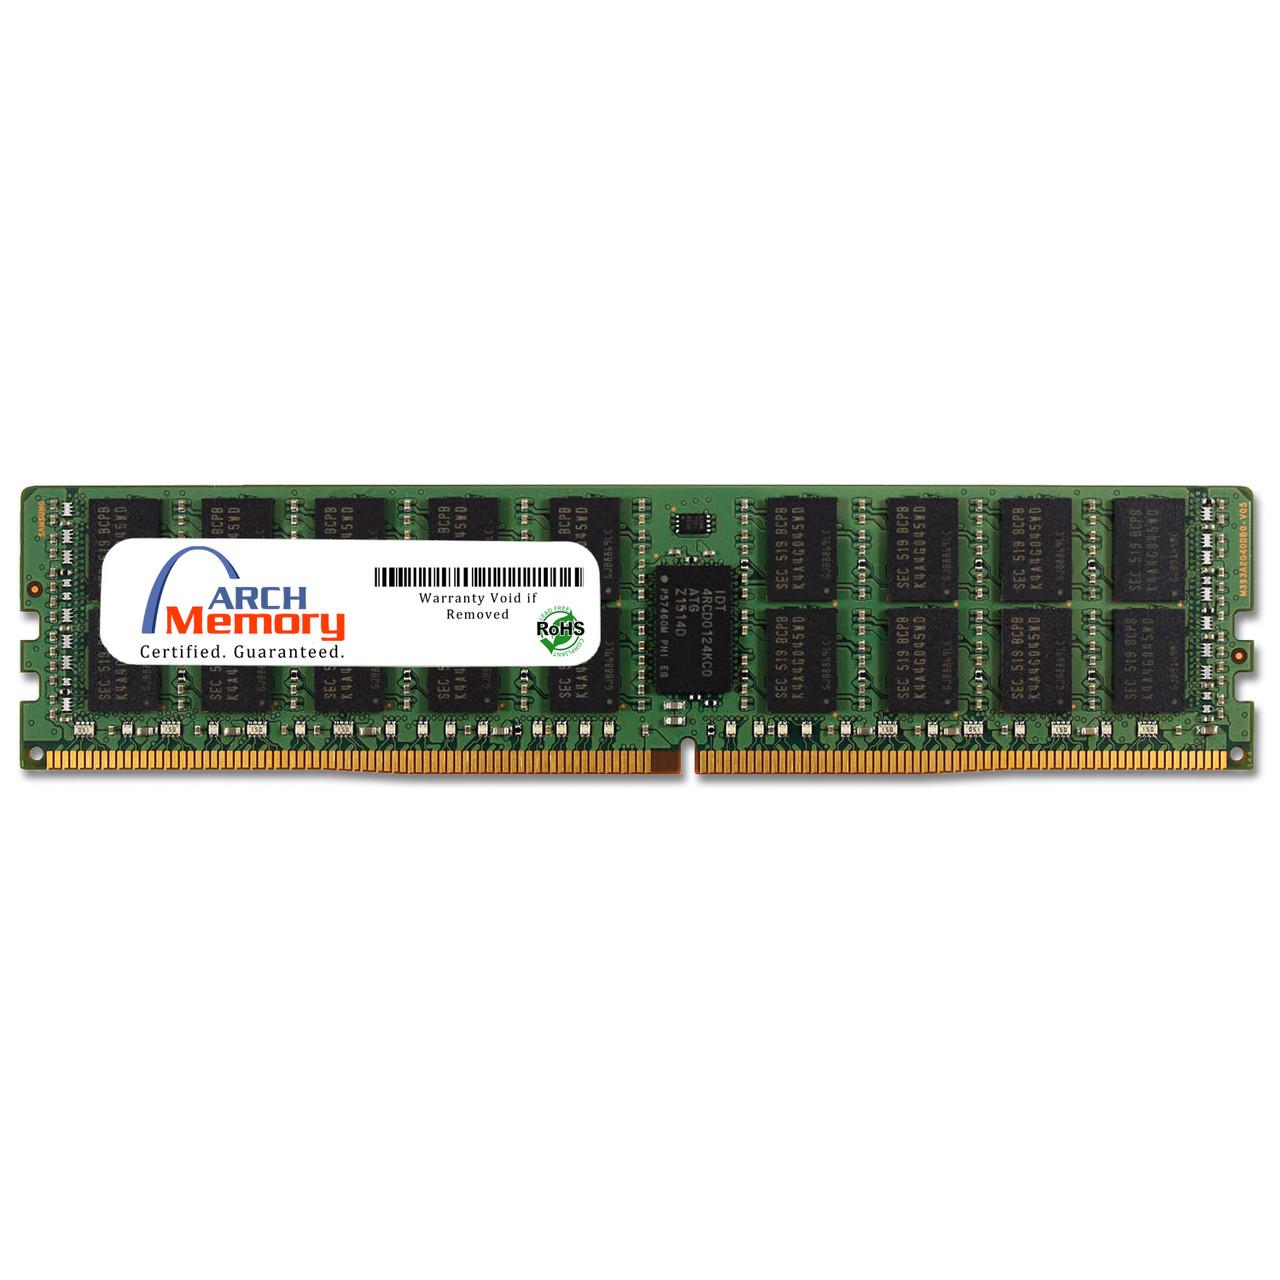 Cisco UCS-MR-X32G2RS-H 32 GB 288-Pin DDR4 2666 MHz RDIMM RAM